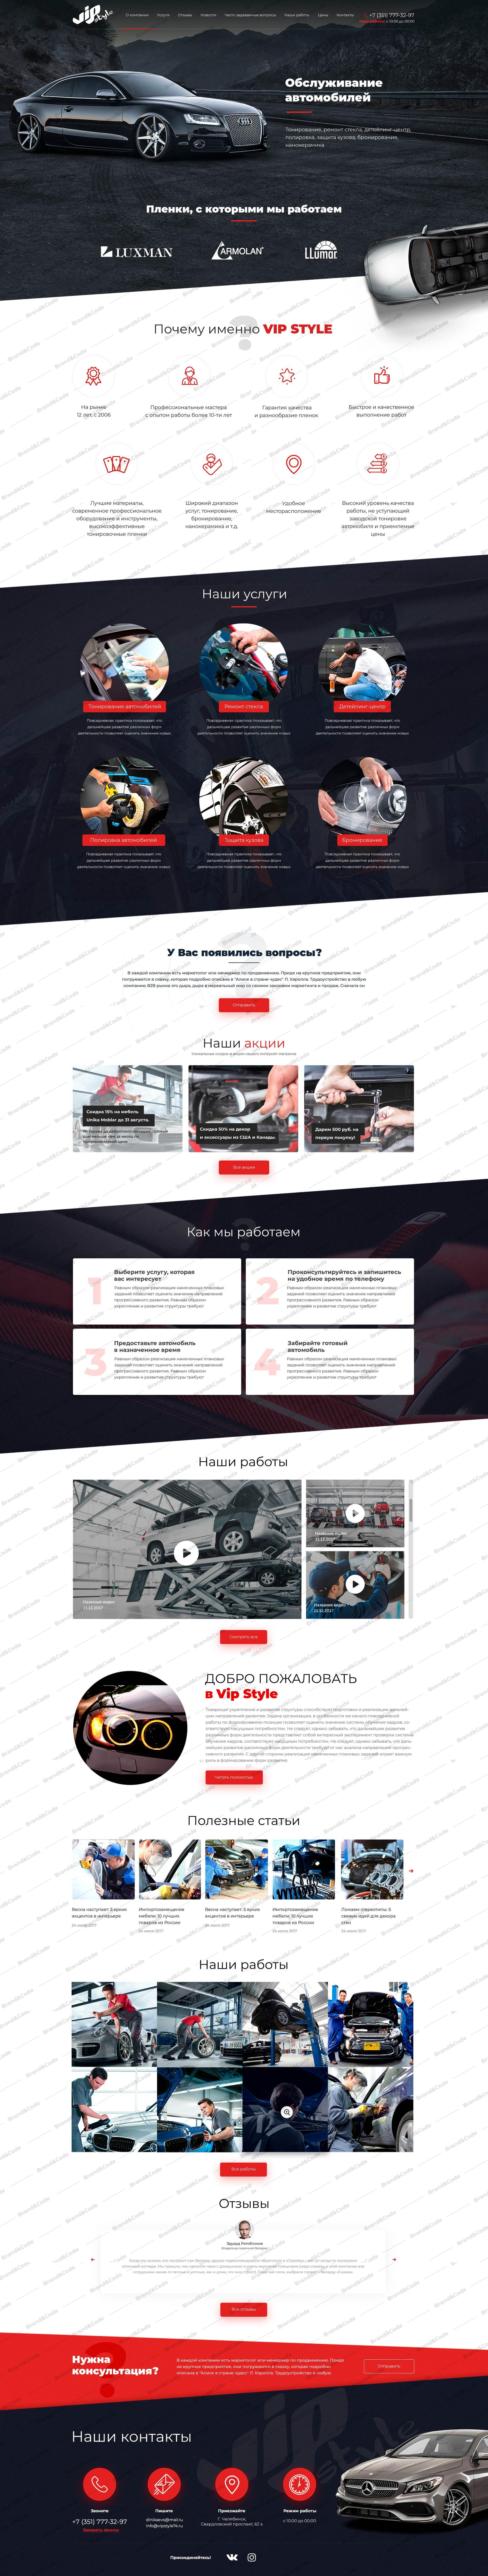 Vip style - Landing Page обслуживание автомобилей